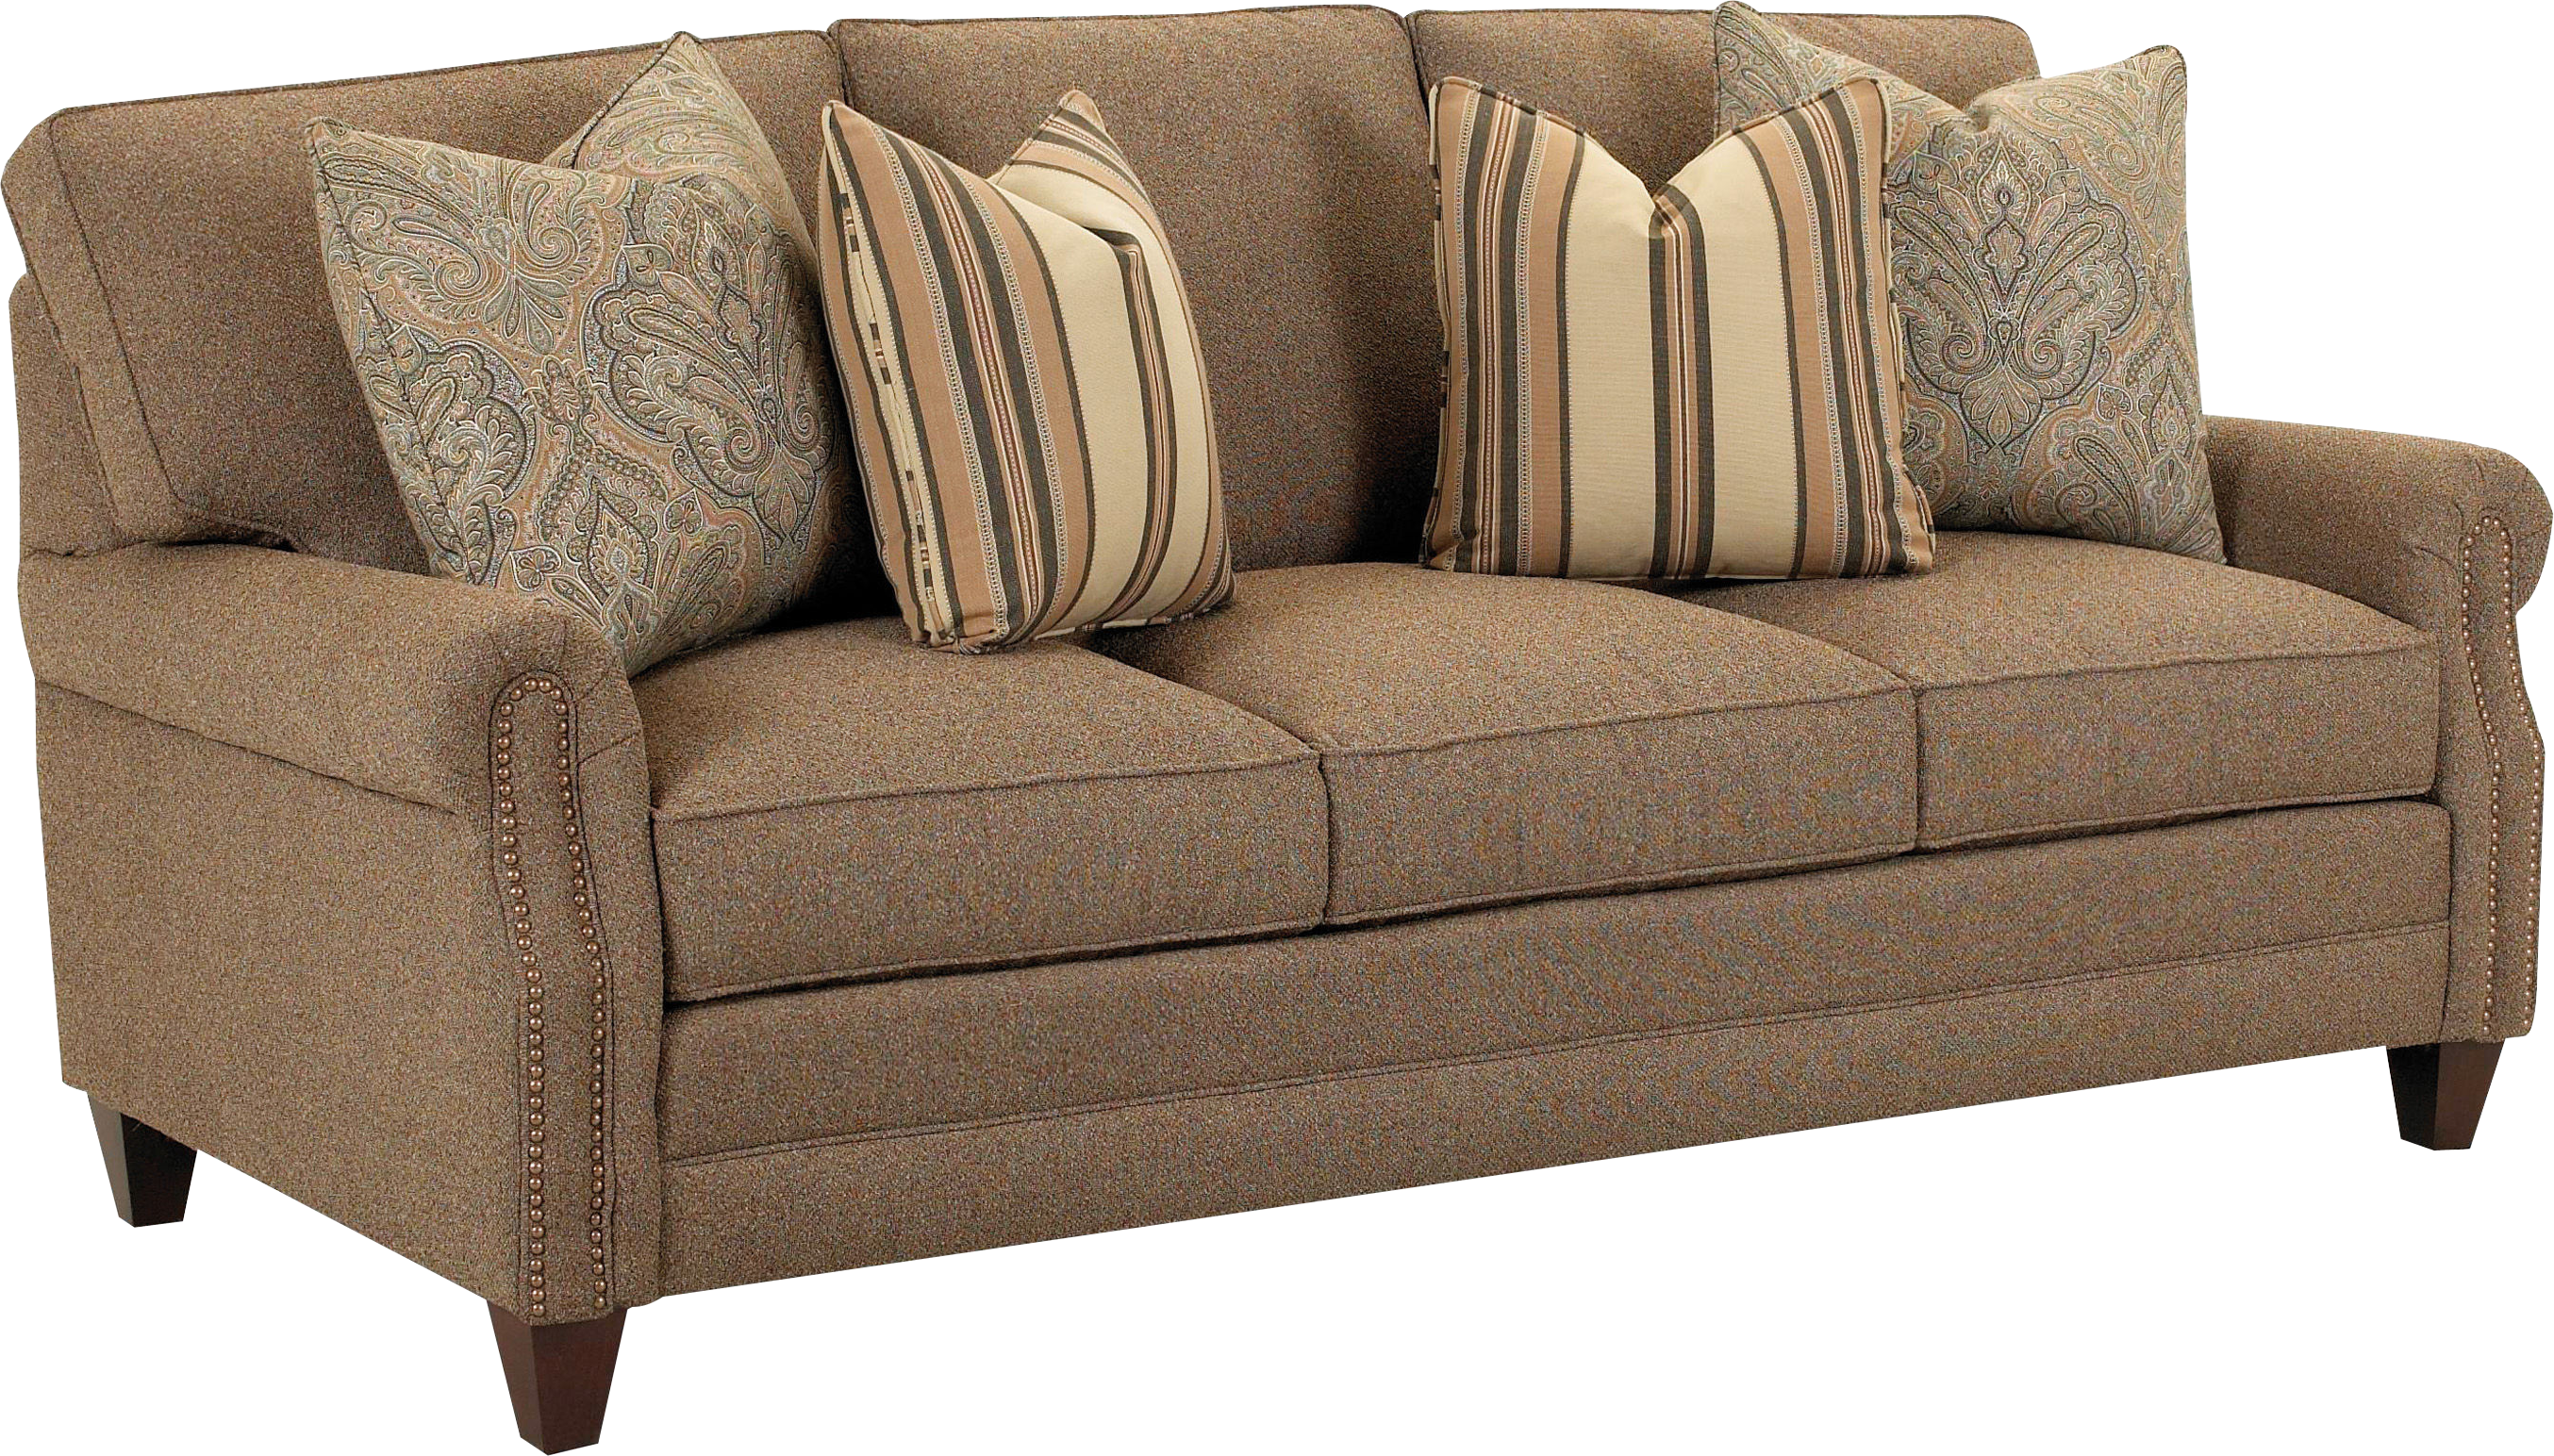 Furniture clipart transparent. Sofa hd png